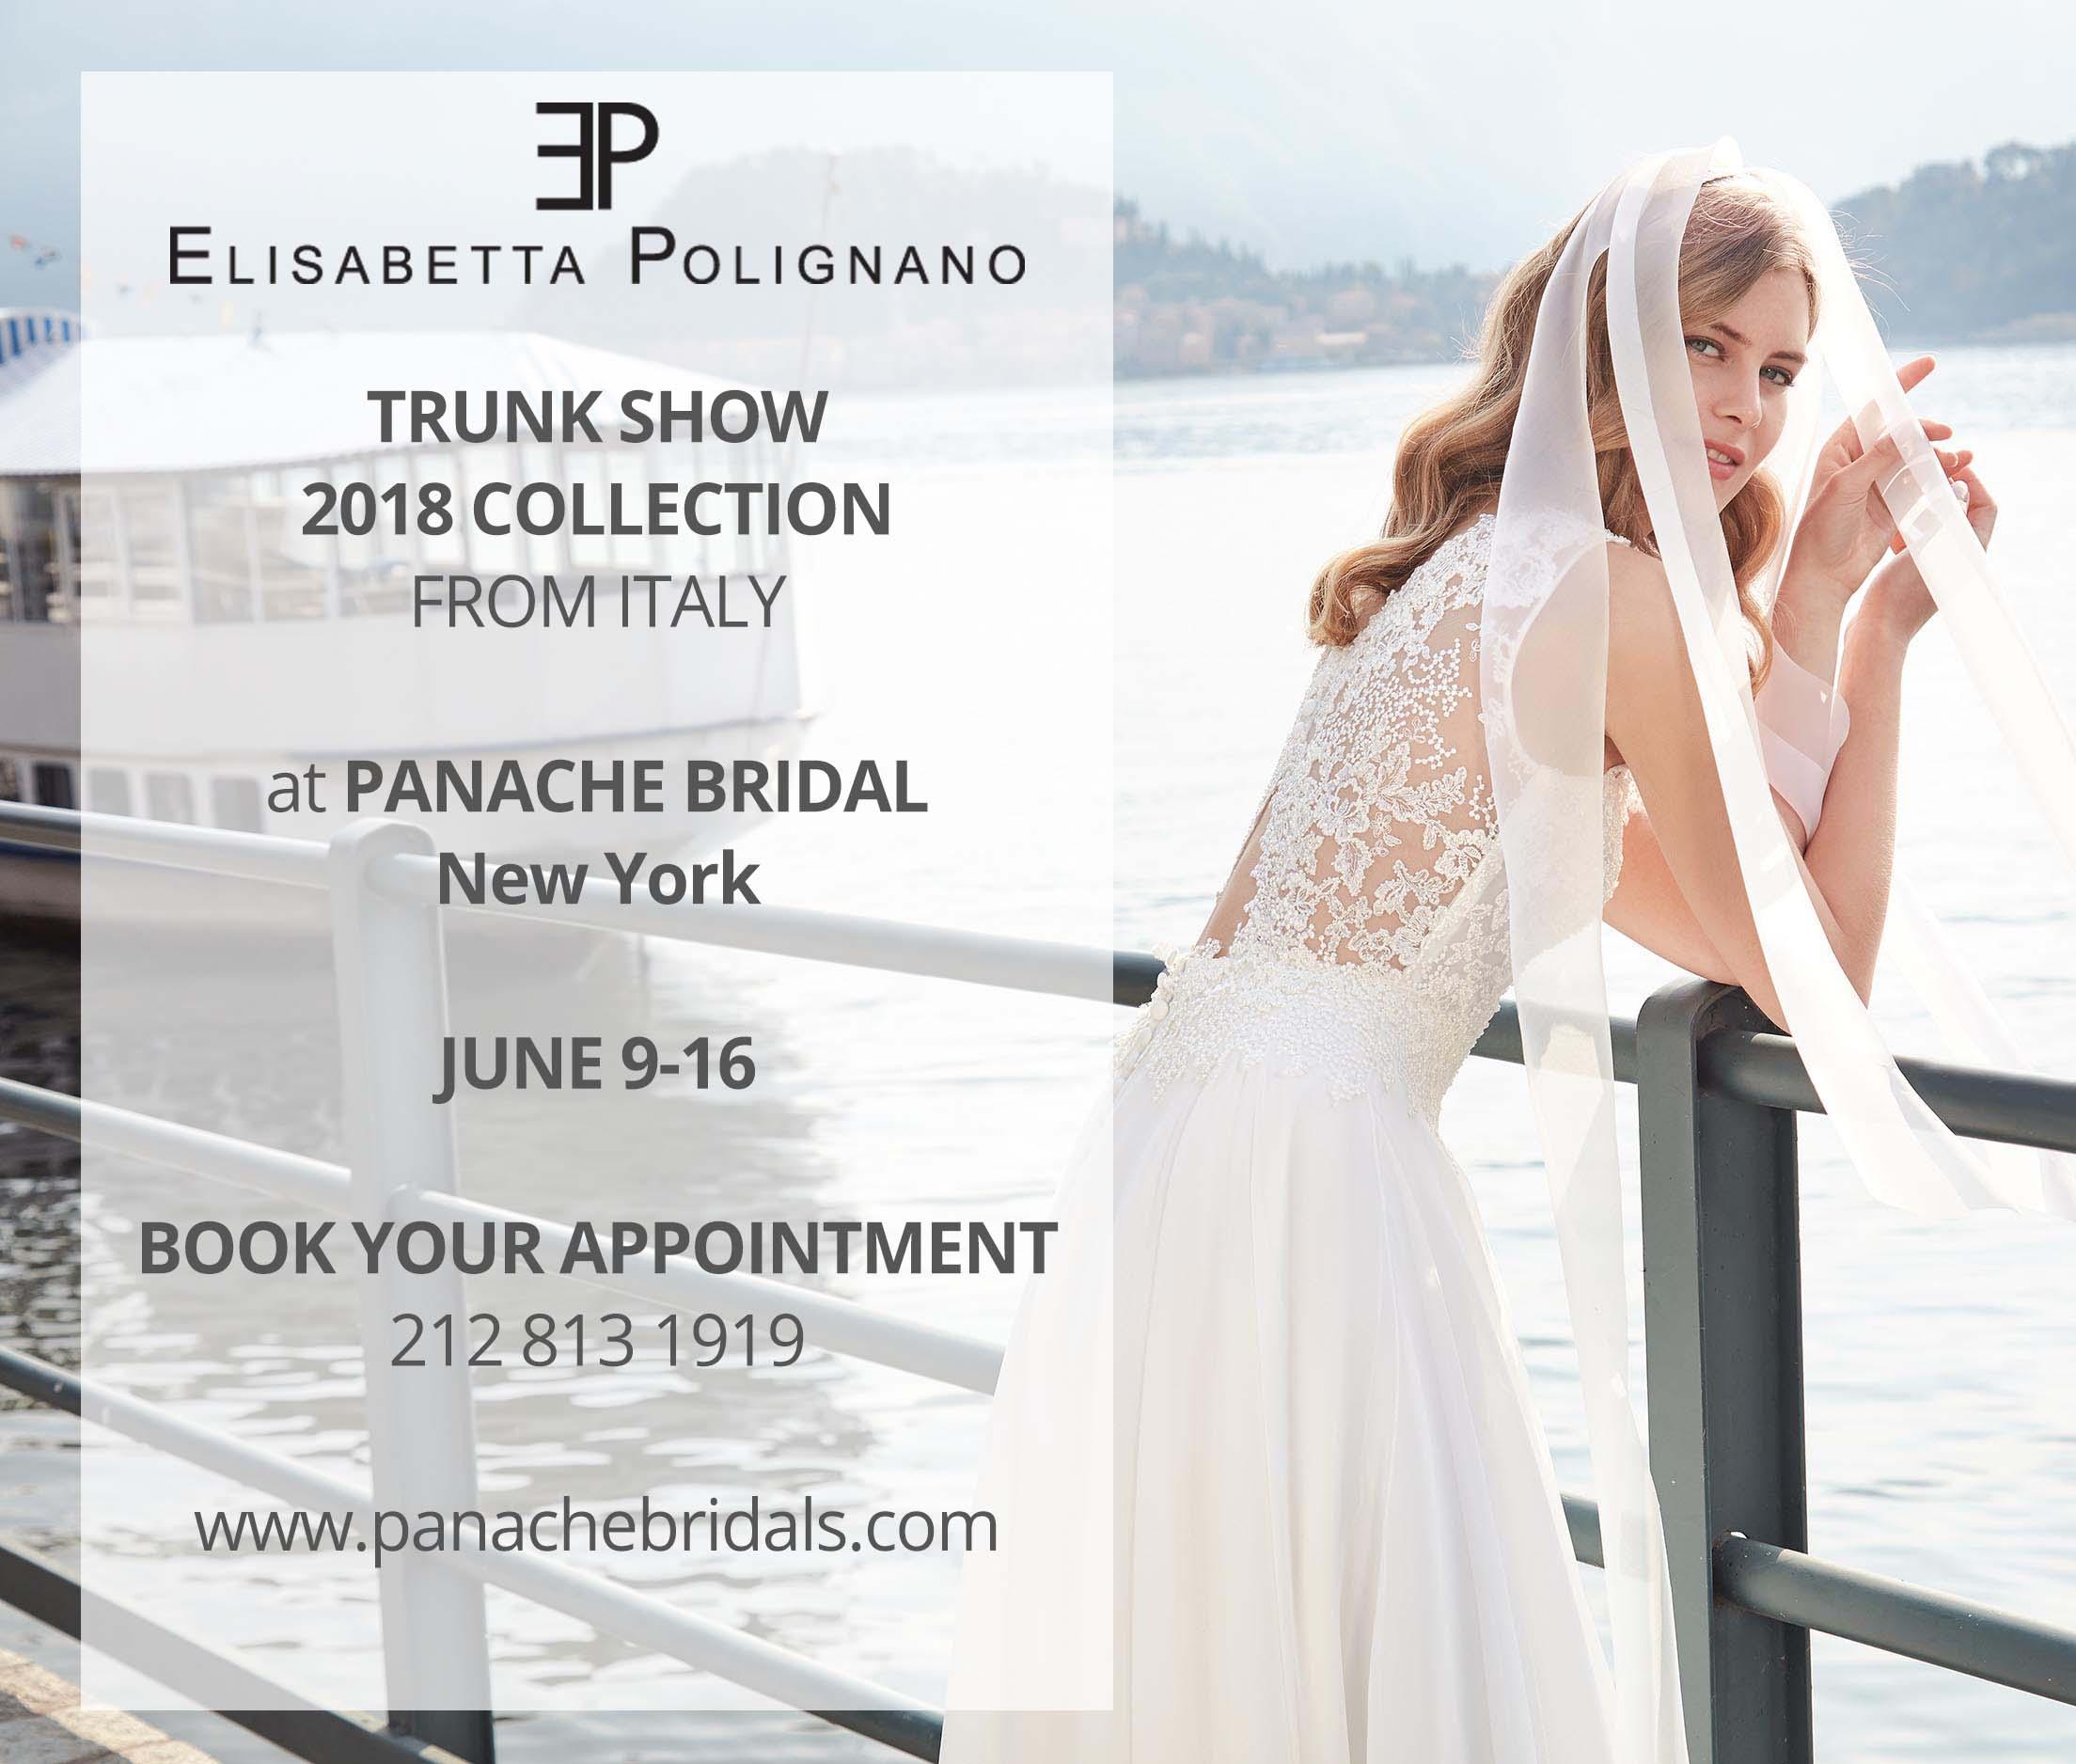 TRUNK SHOW USA Panache Bridal – New York